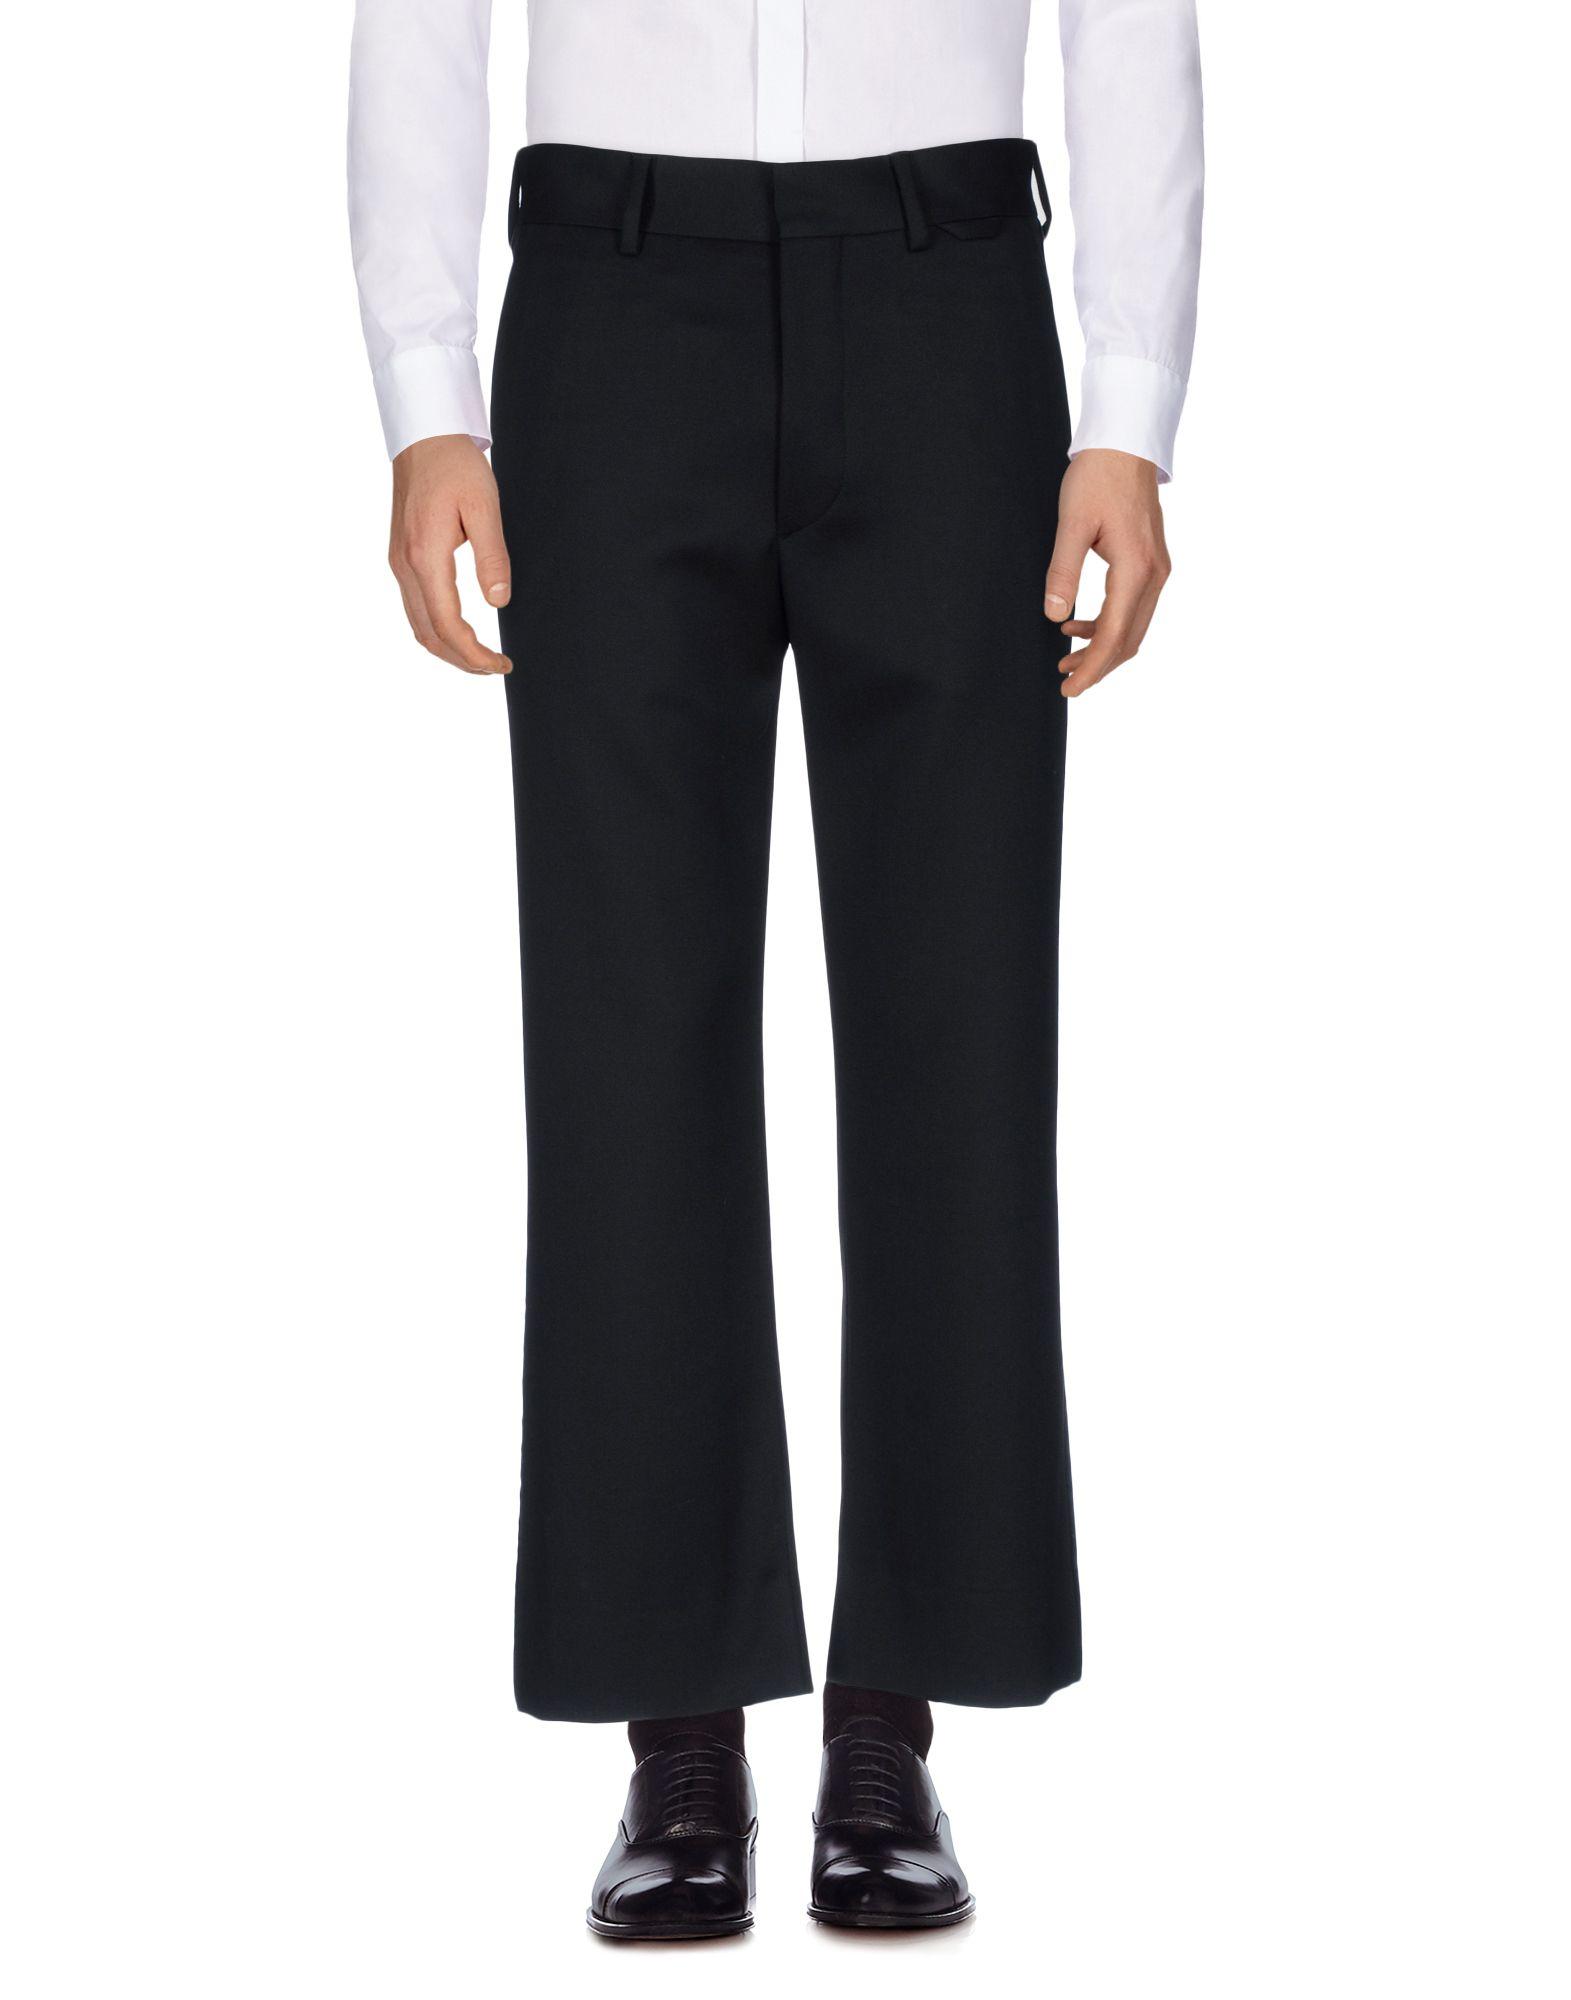 Acquista Prada Pantalone su Uomo online ZYwY7E8q